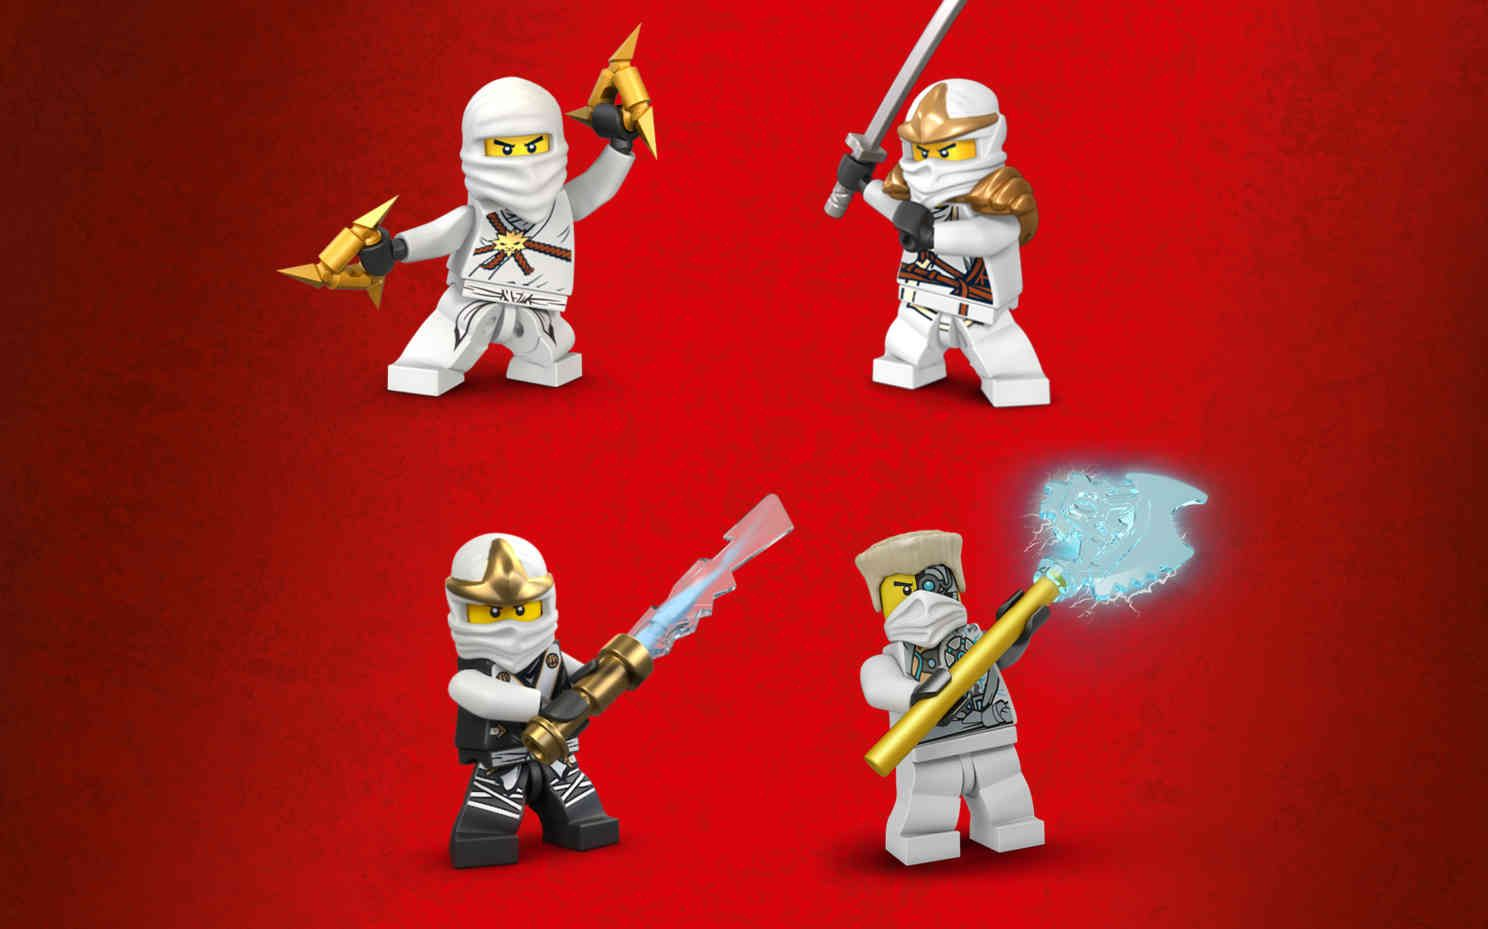 Zane personnages ninjago lego party - Personnage ninjago lego ...